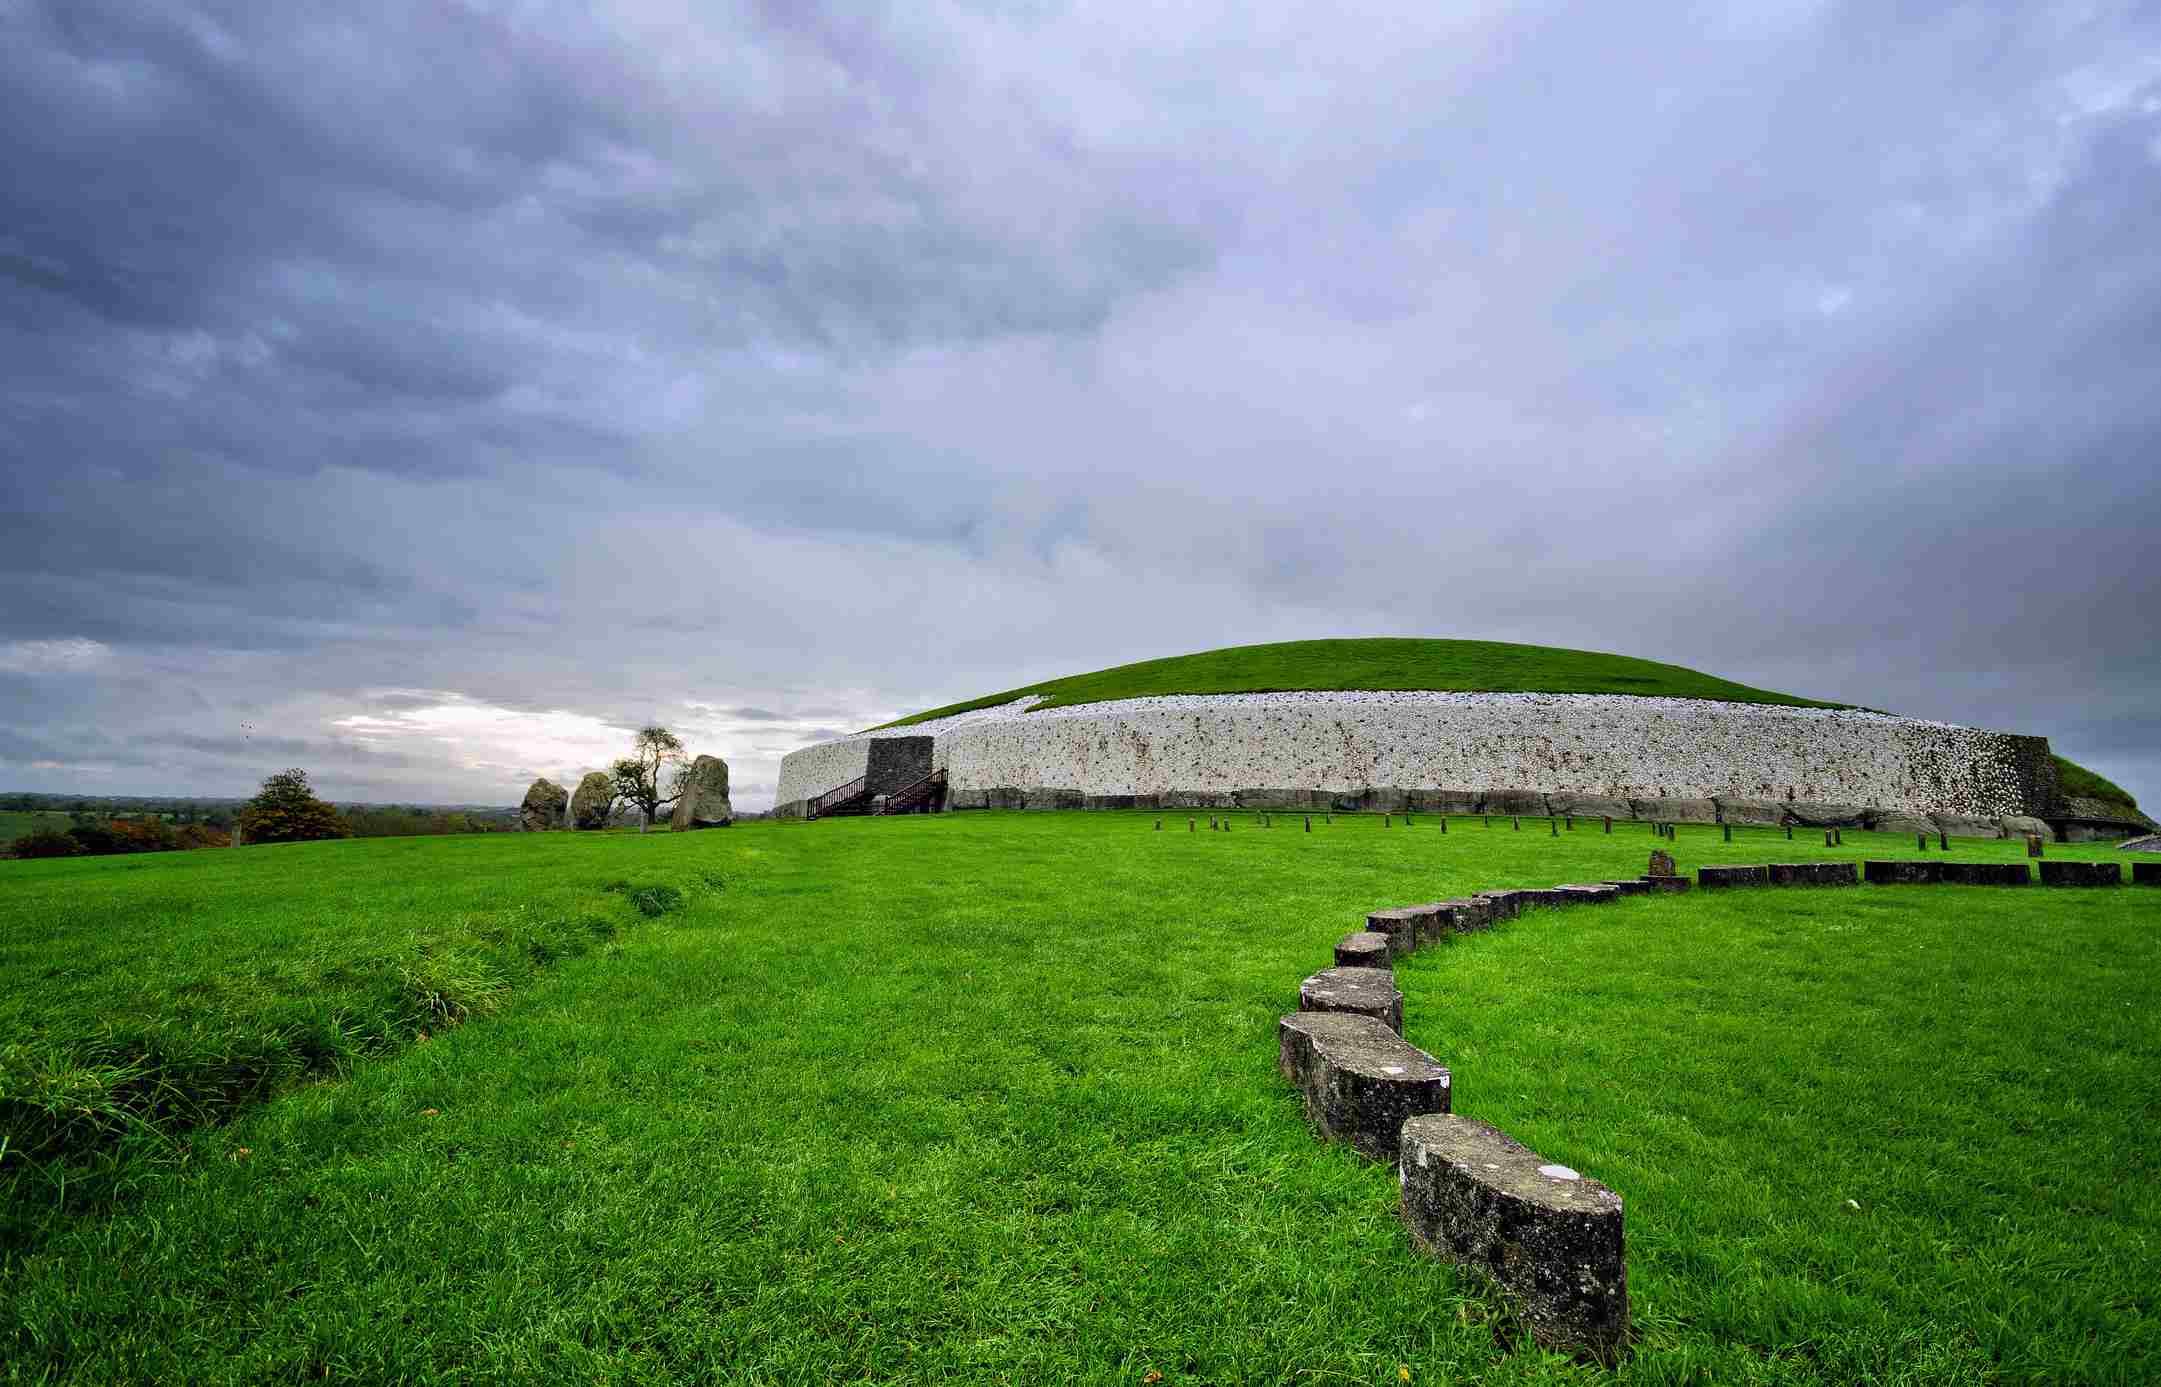 Newgrange Megalithic Passage Tomb